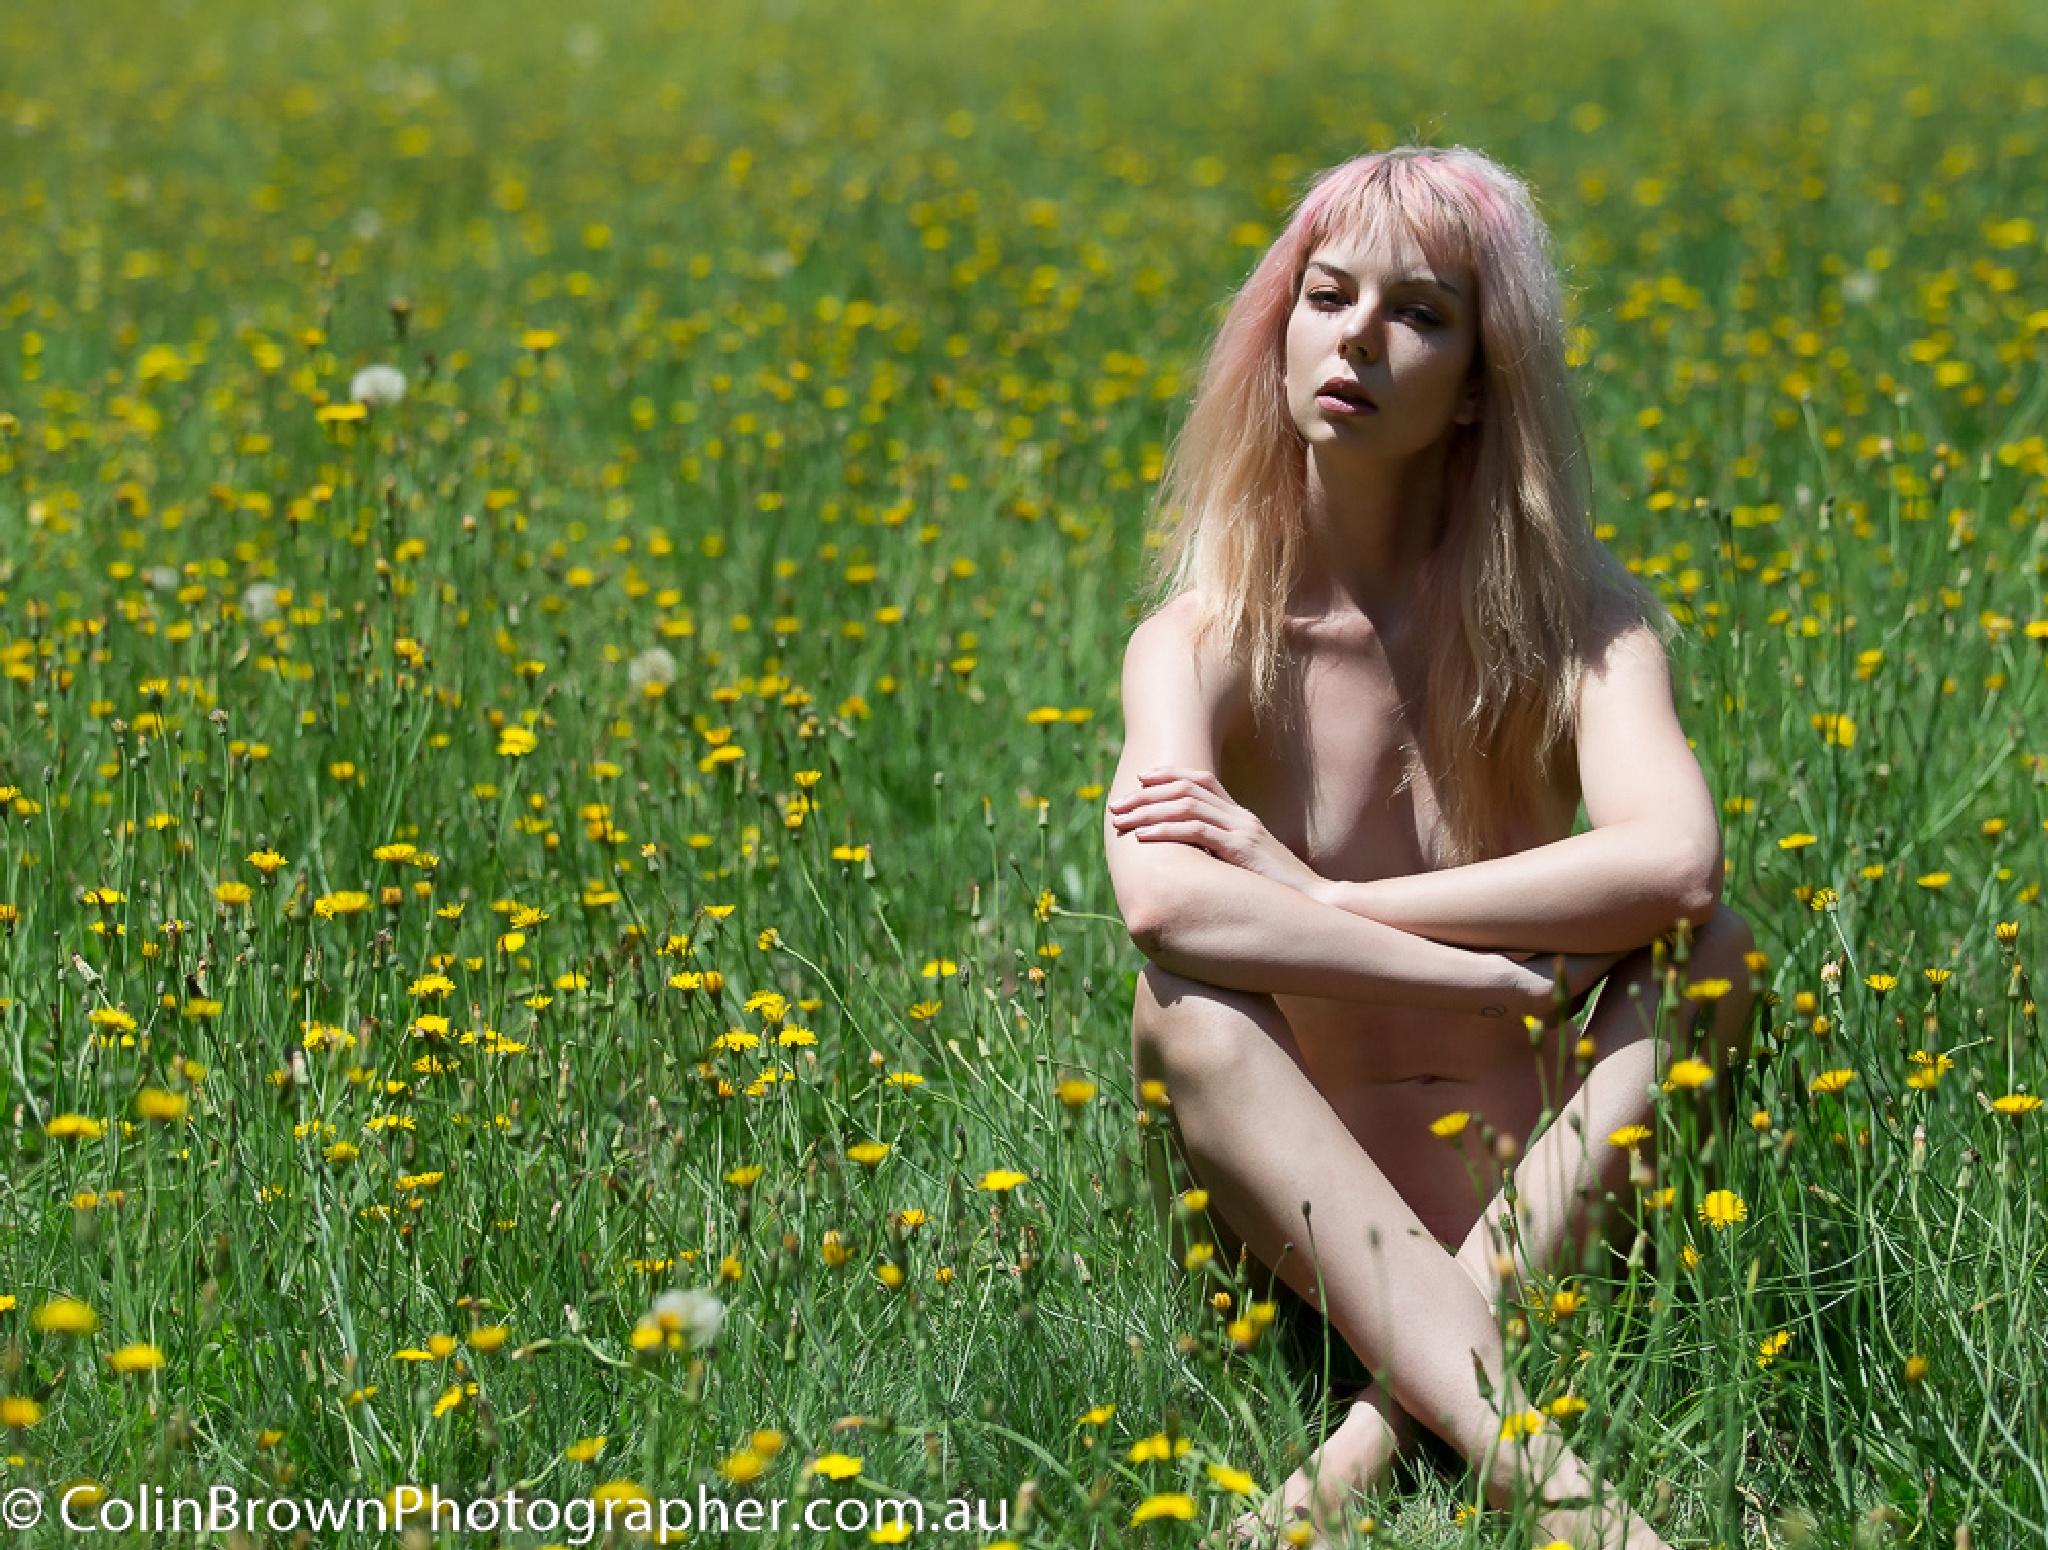 Dandelions in the Dandenongs by ColinBrownPhotographer